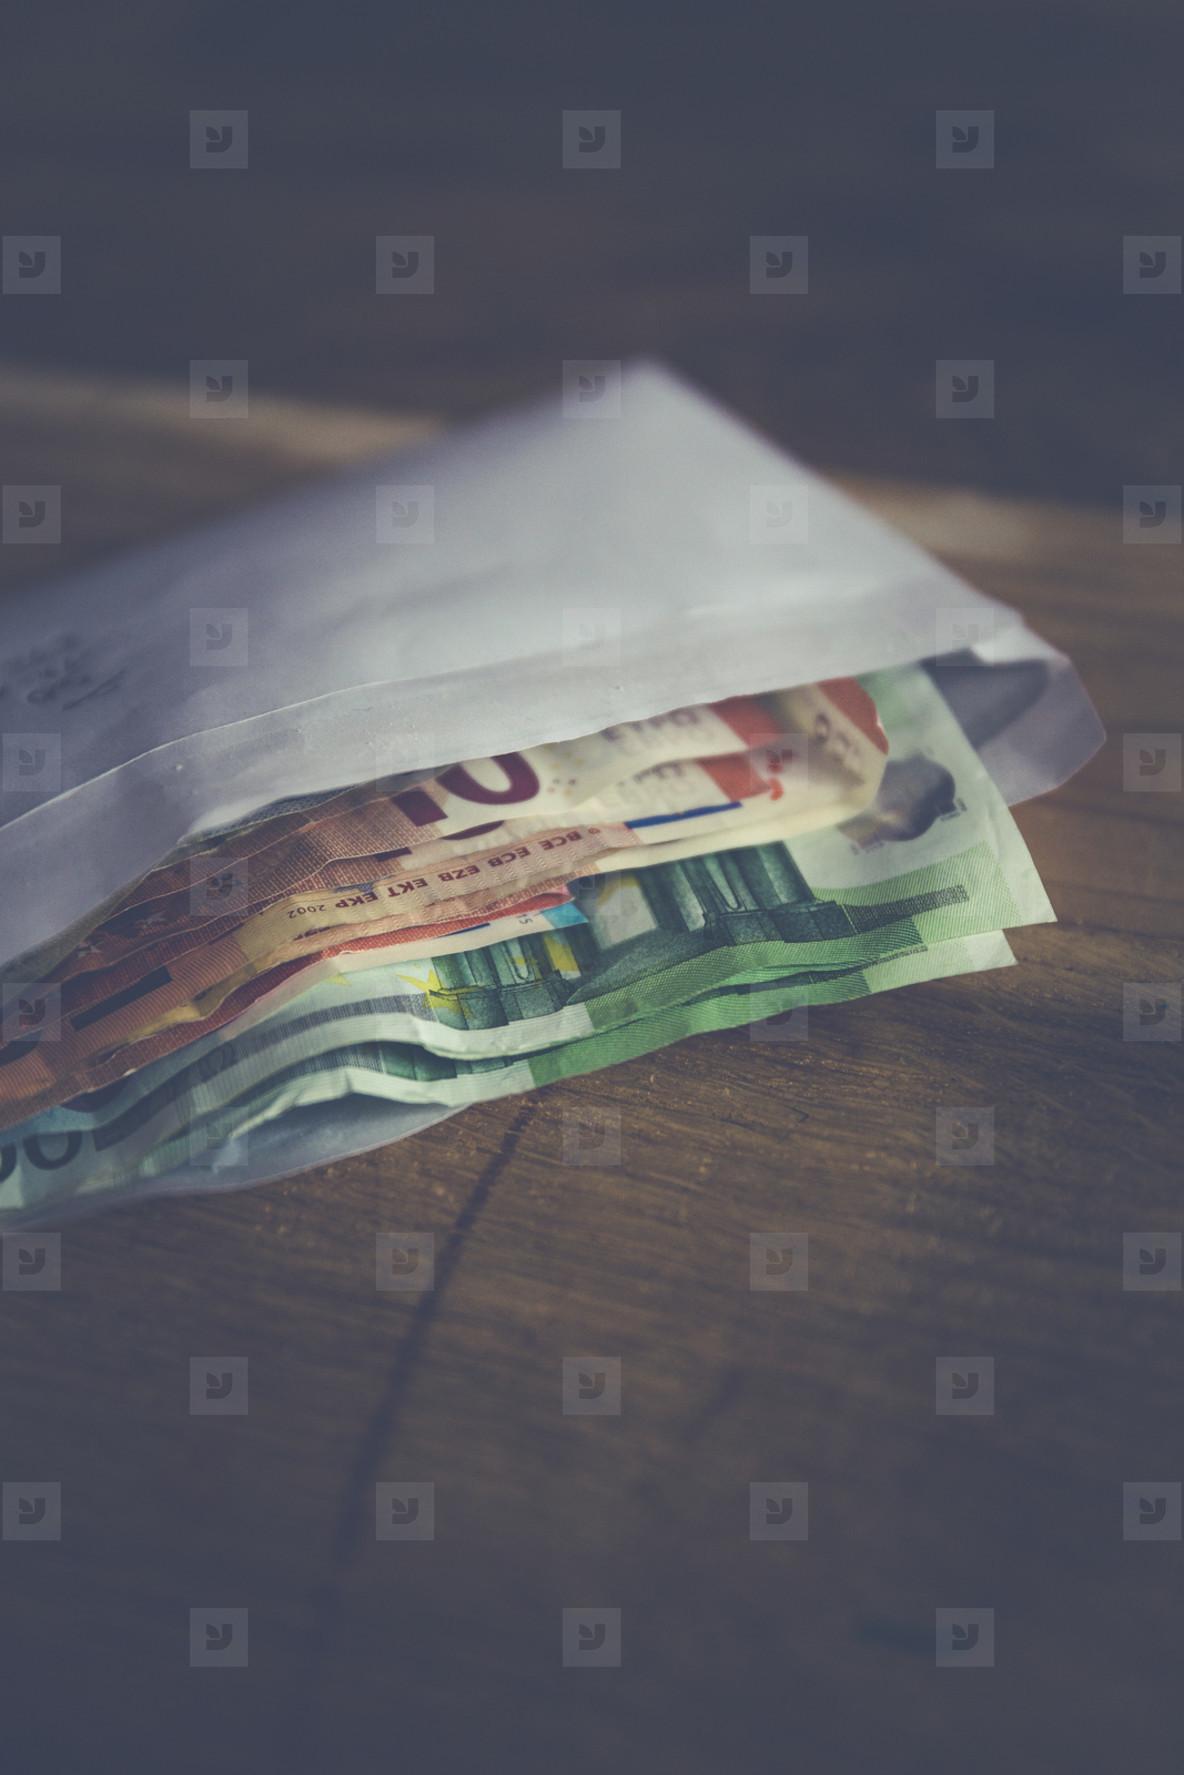 corrupt money kickback note